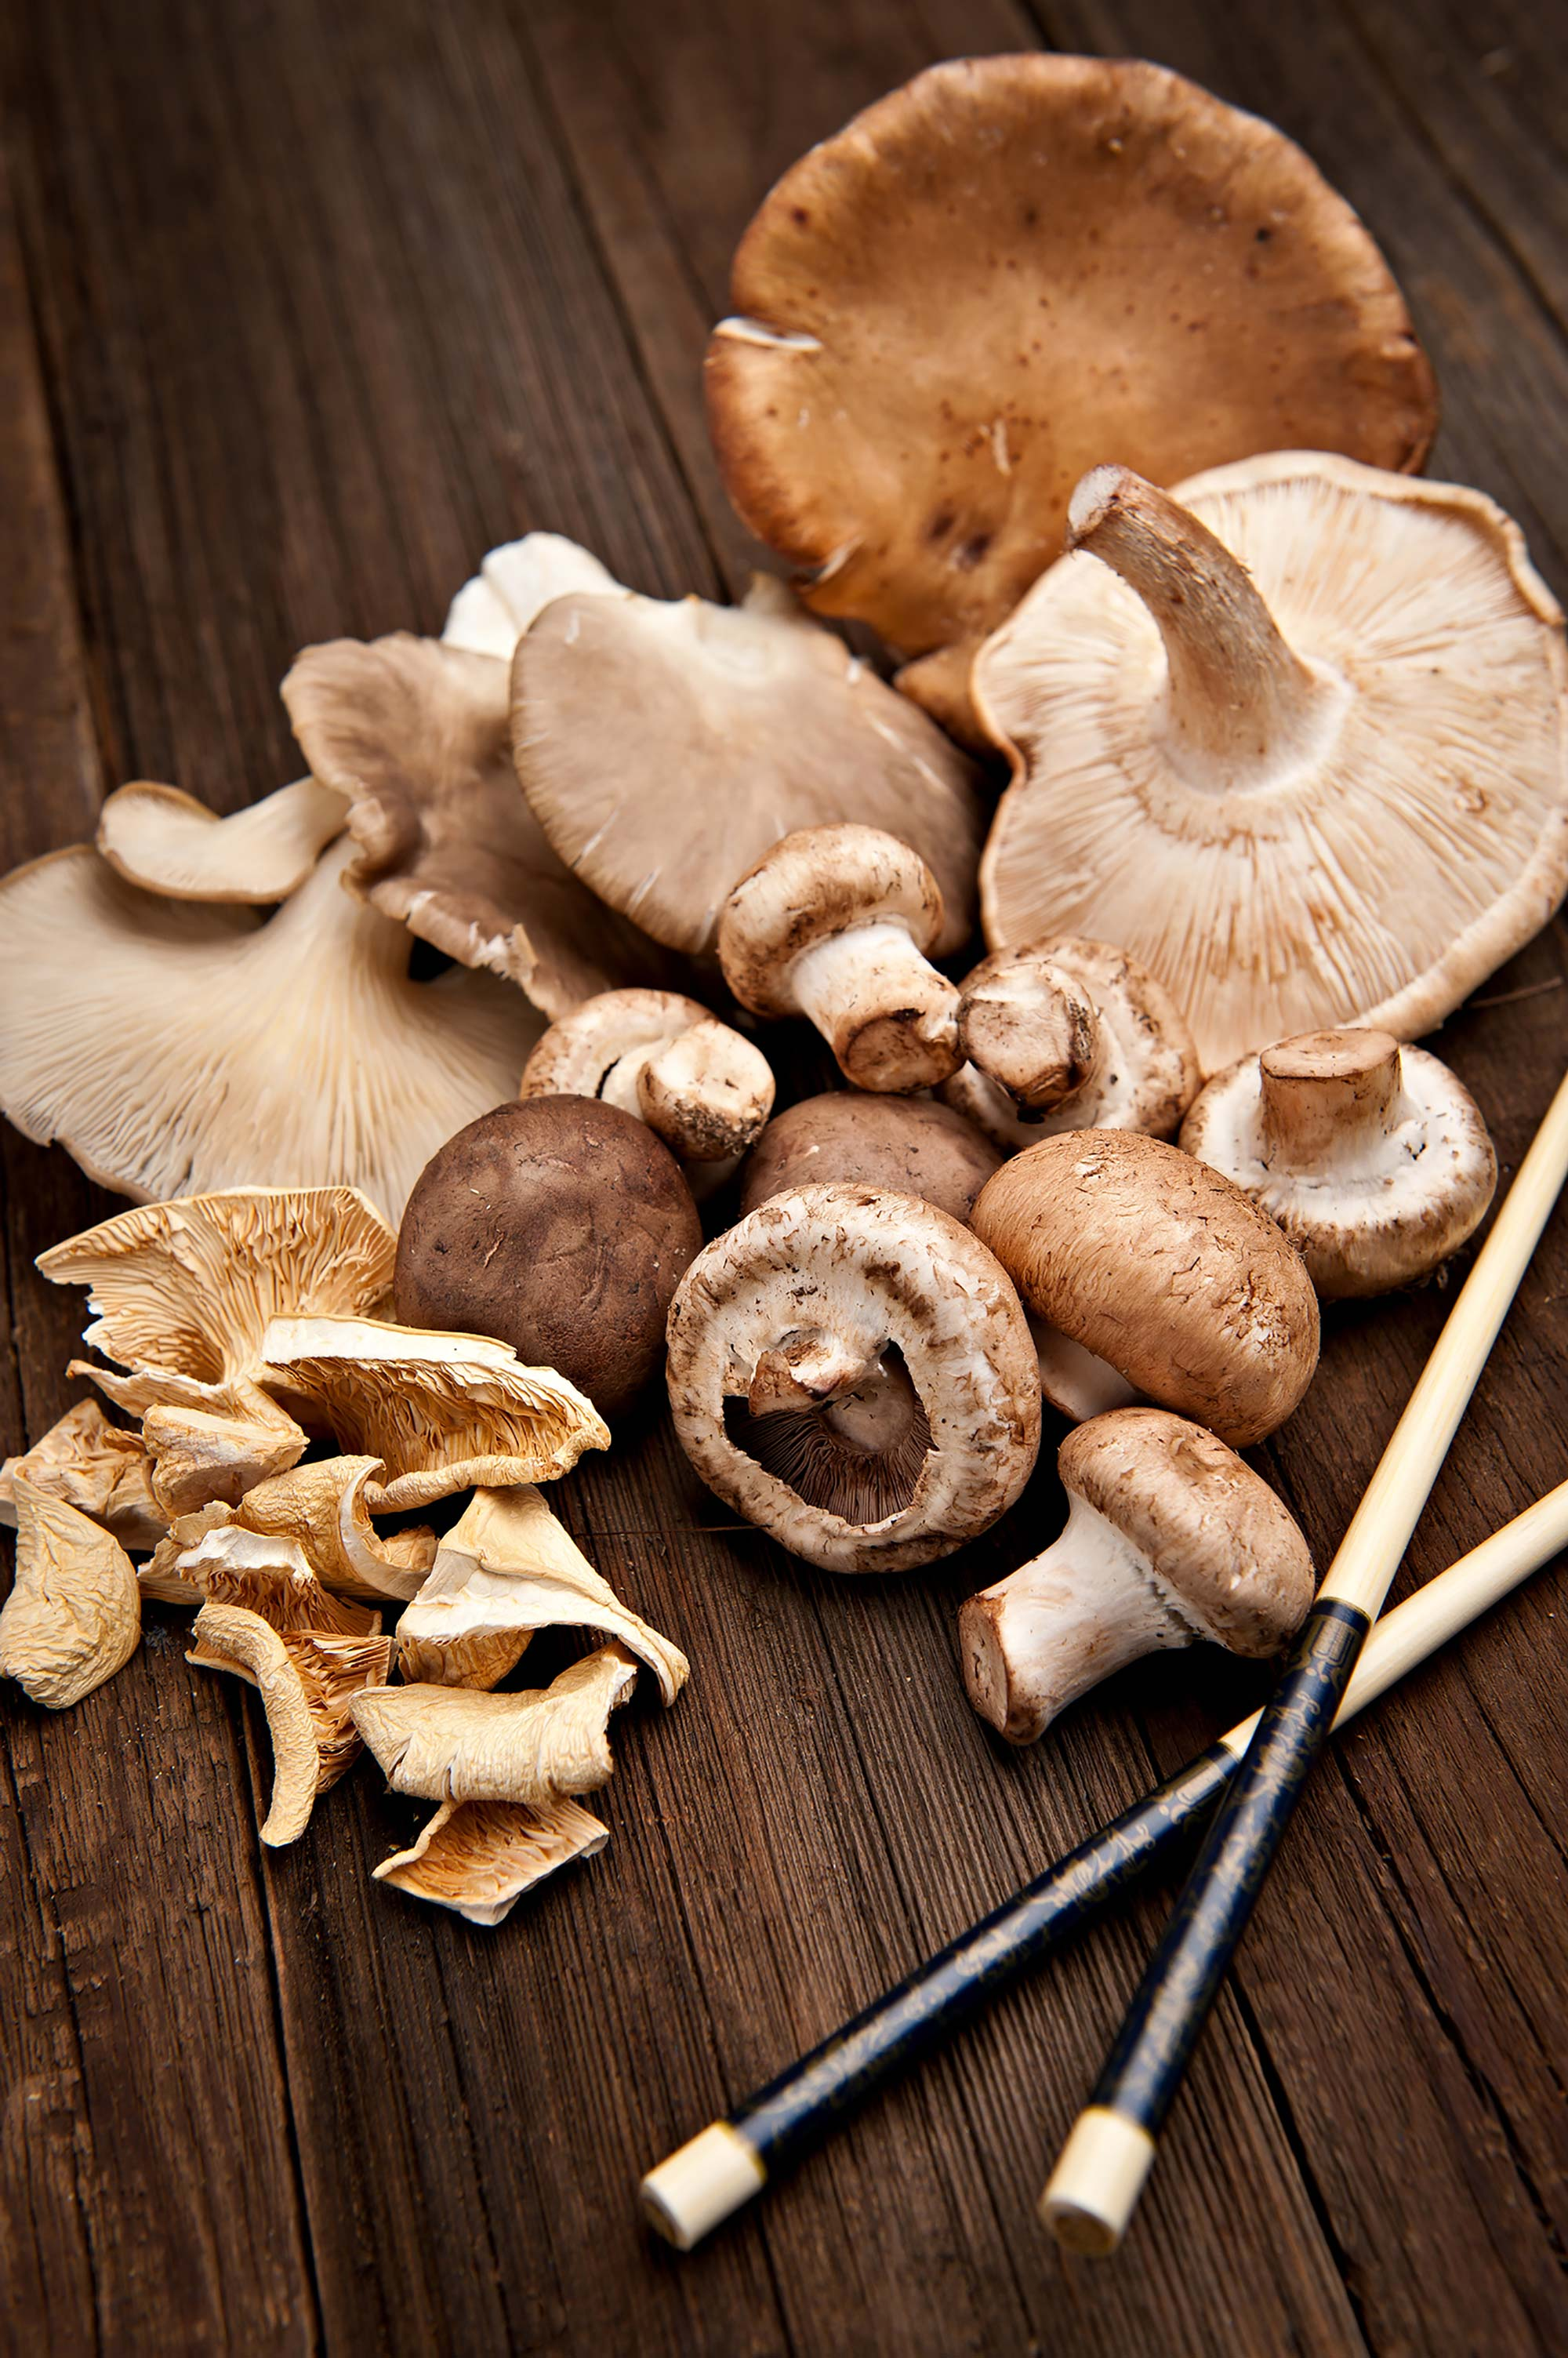 variety of mushrooms with chopsticks